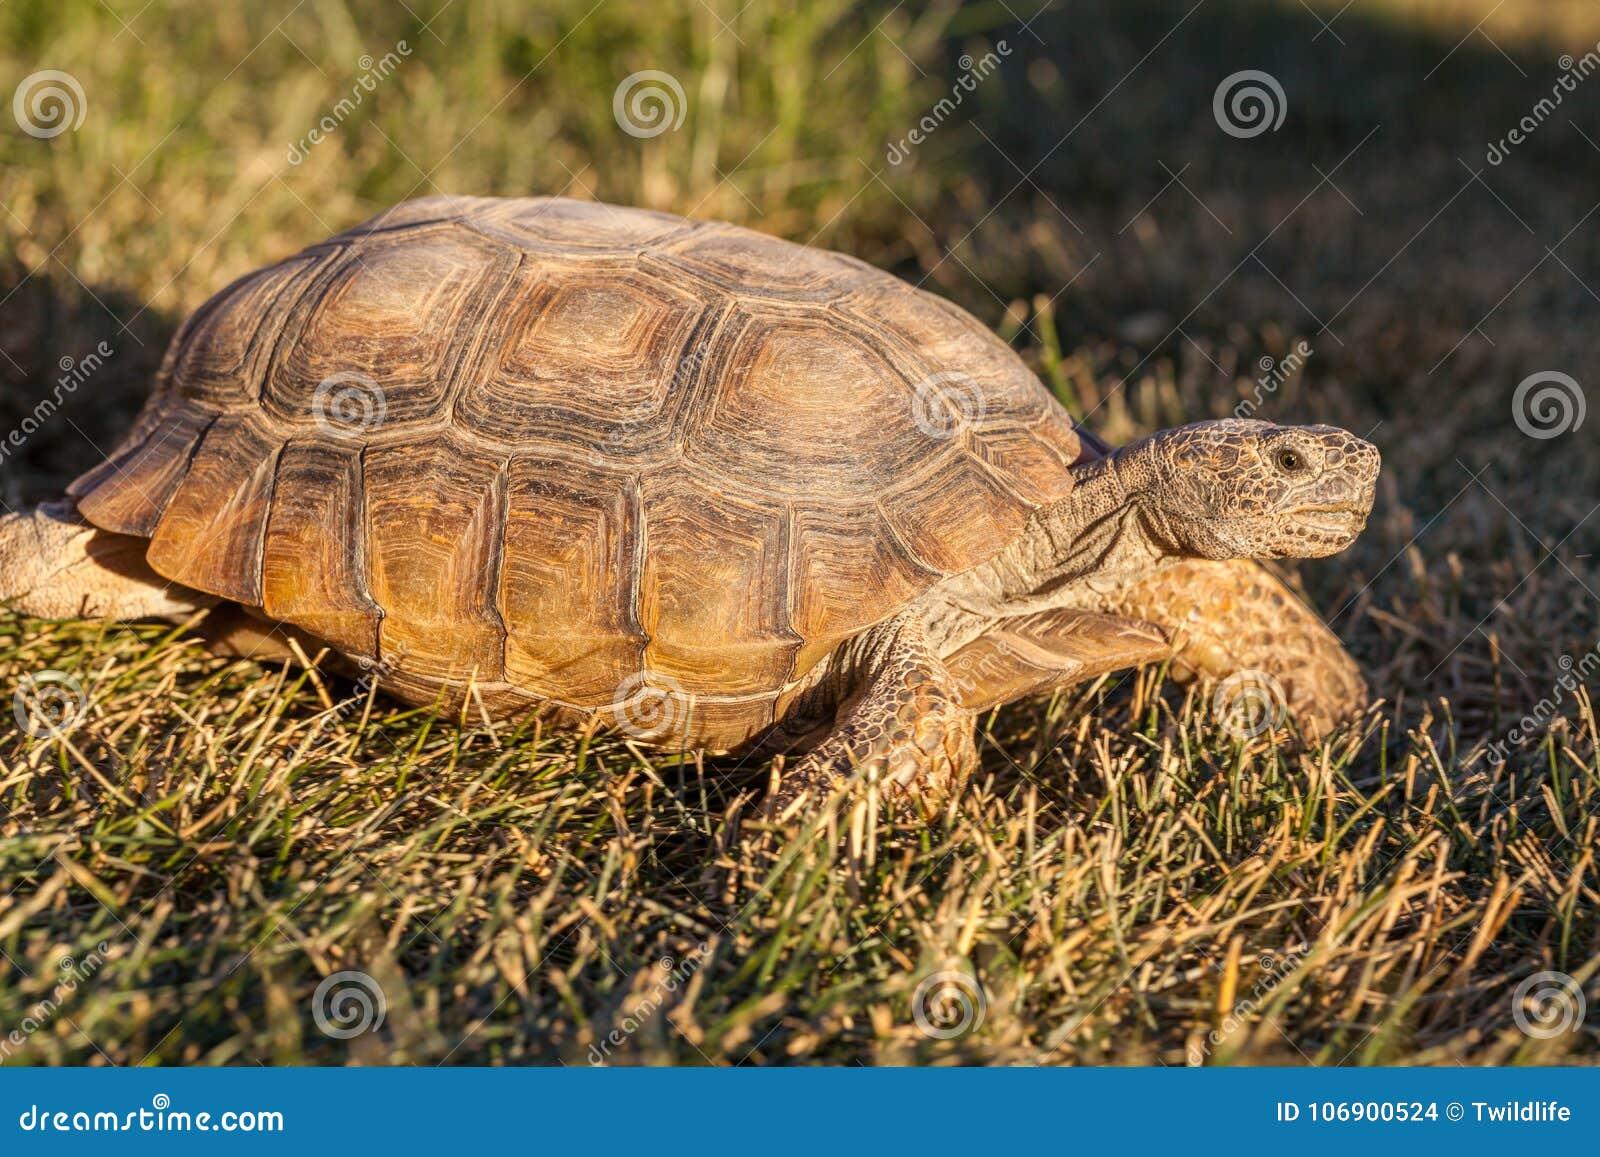 Desert Tortoise in Arizona